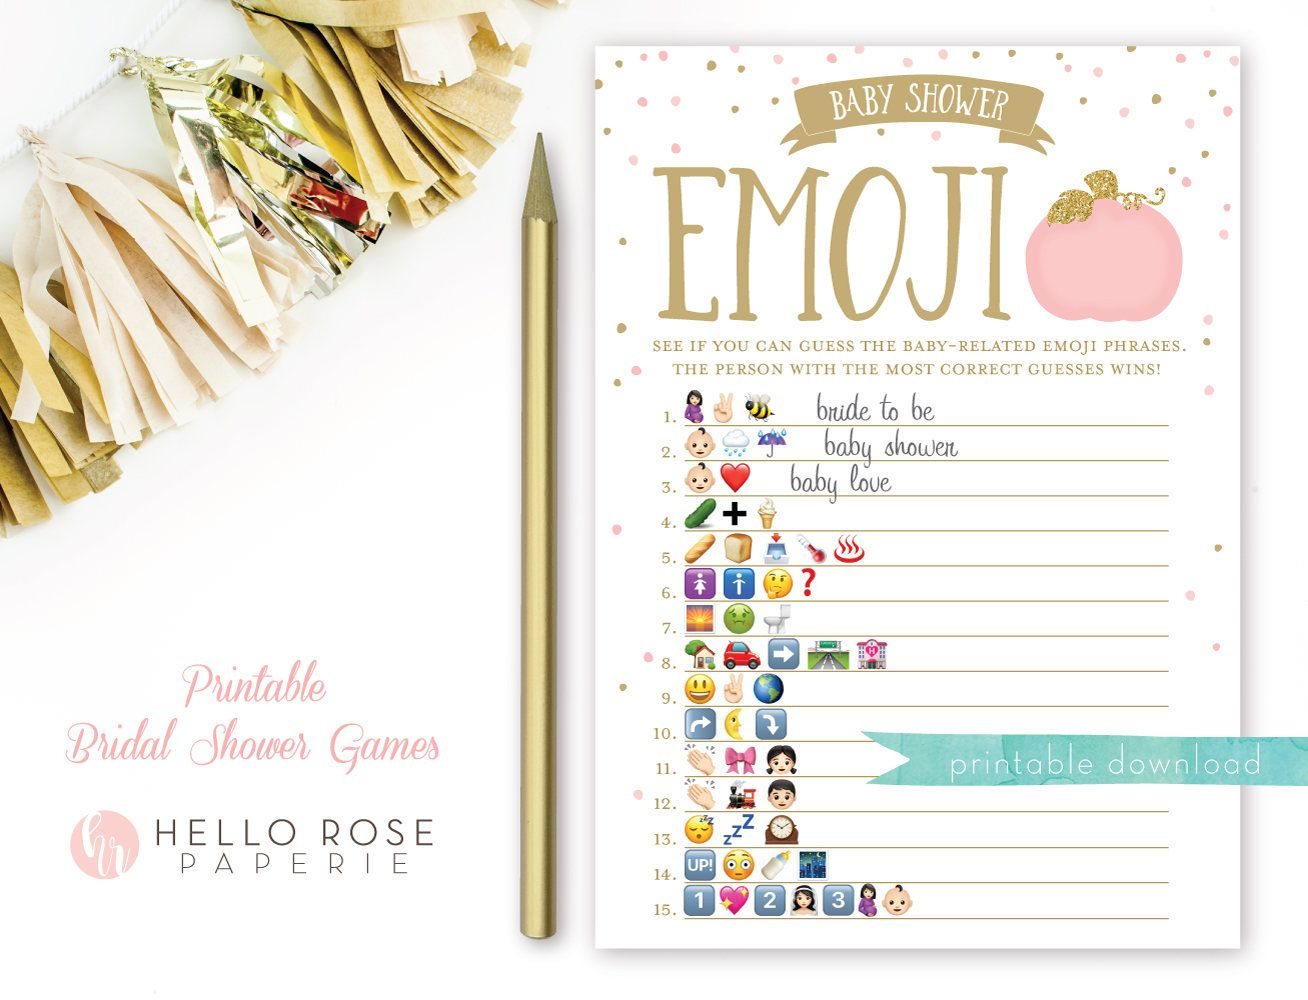 Pumpkin Baby Shower Emoji Pictionary Game + Answer Key Pink And Gold - Wedding Emoji Pictionary Free Printable